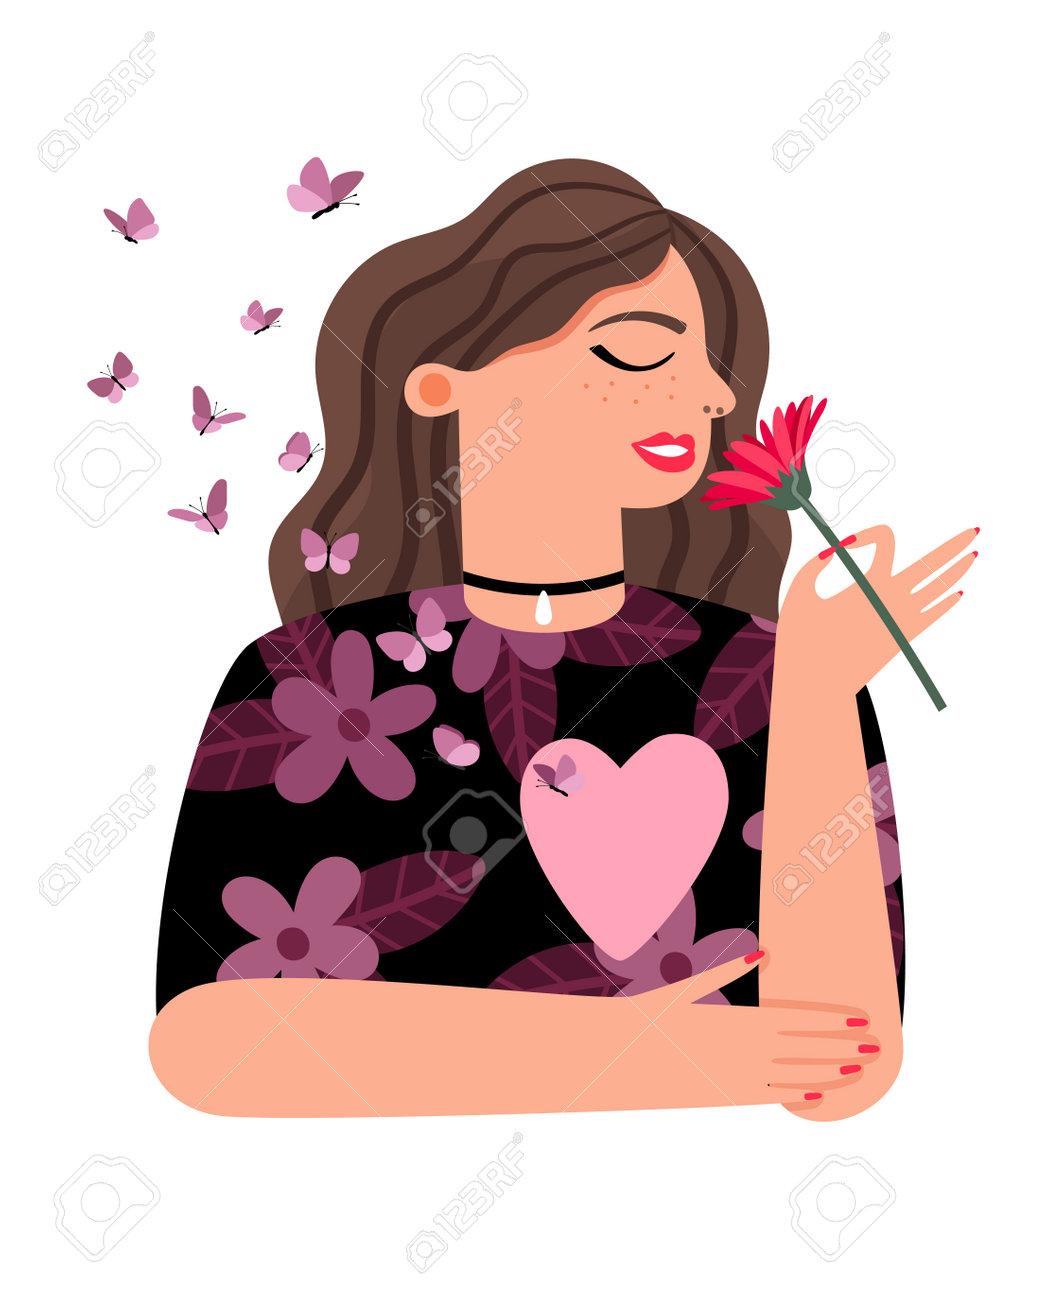 Proud girl loving yourself - 171598618